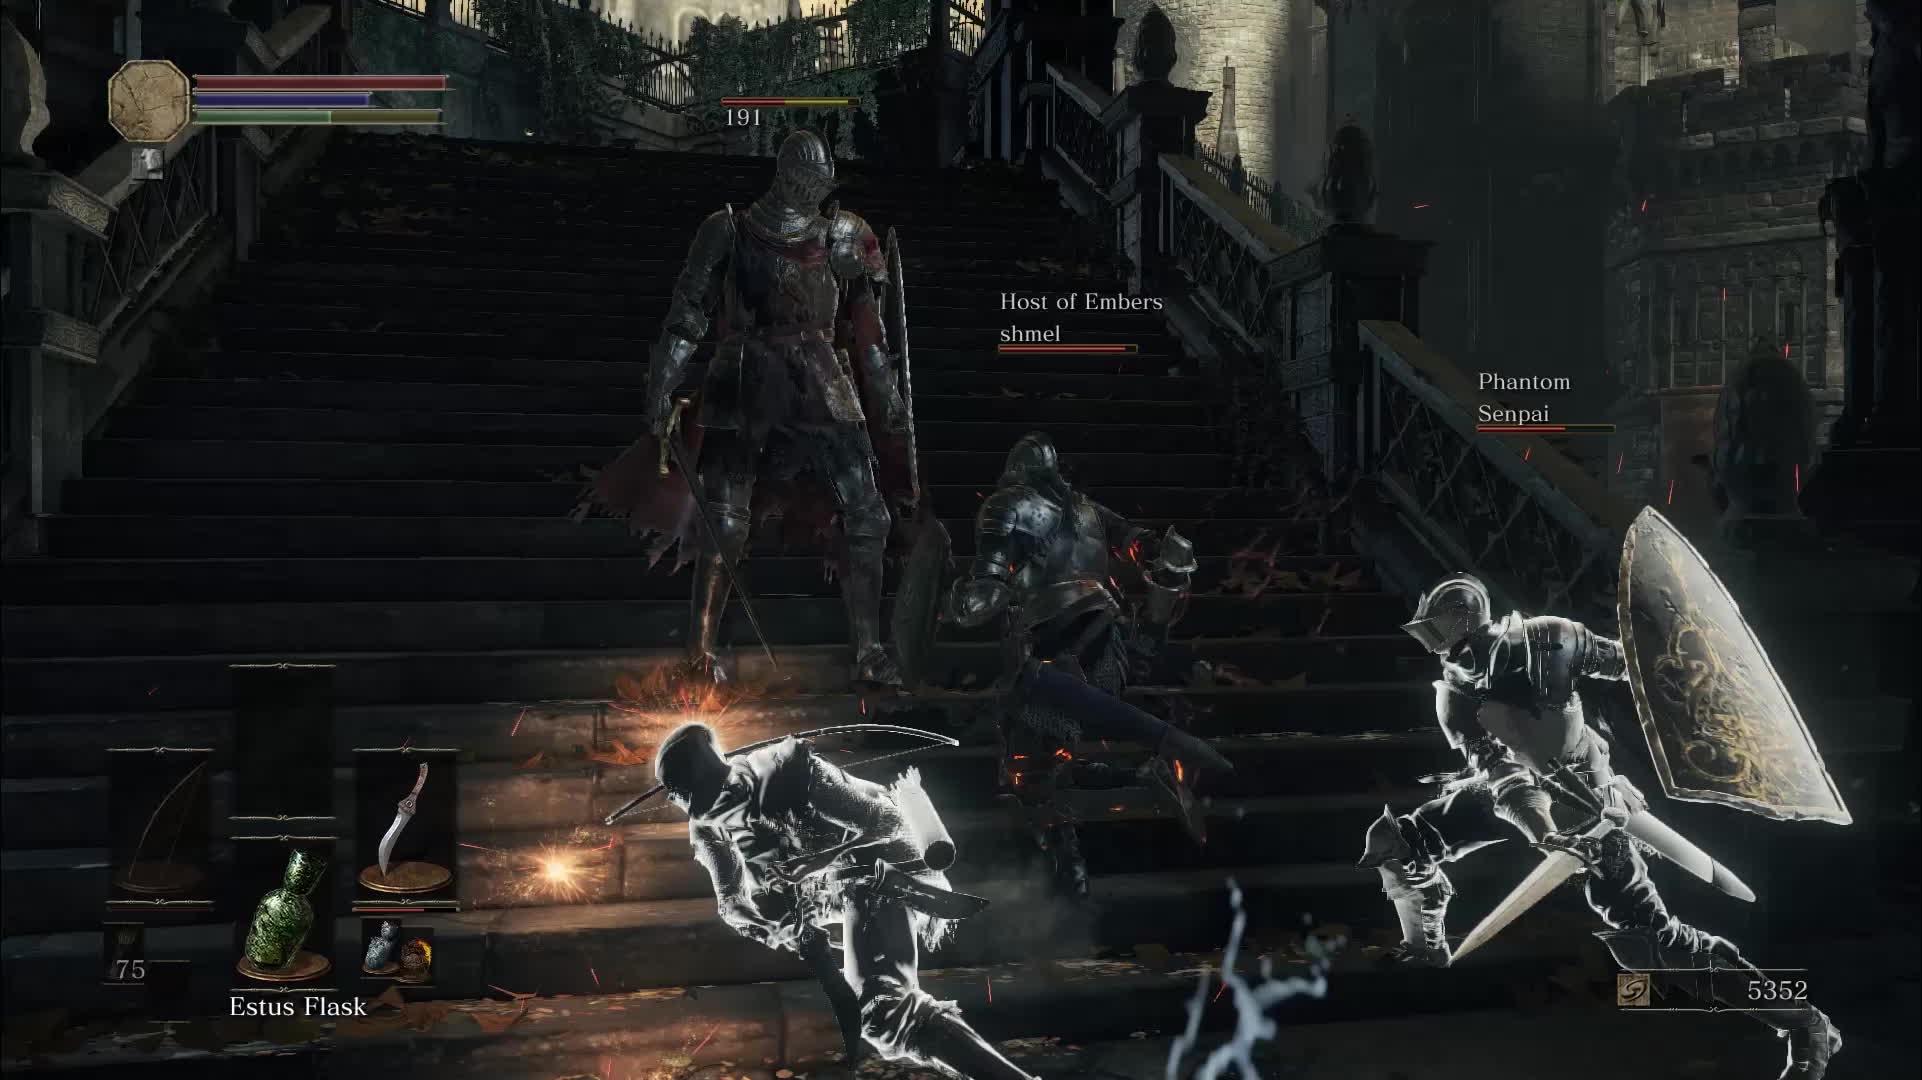 GamePhysics, Dark Souls 3 - My Lord of Cinder needs me GIFs